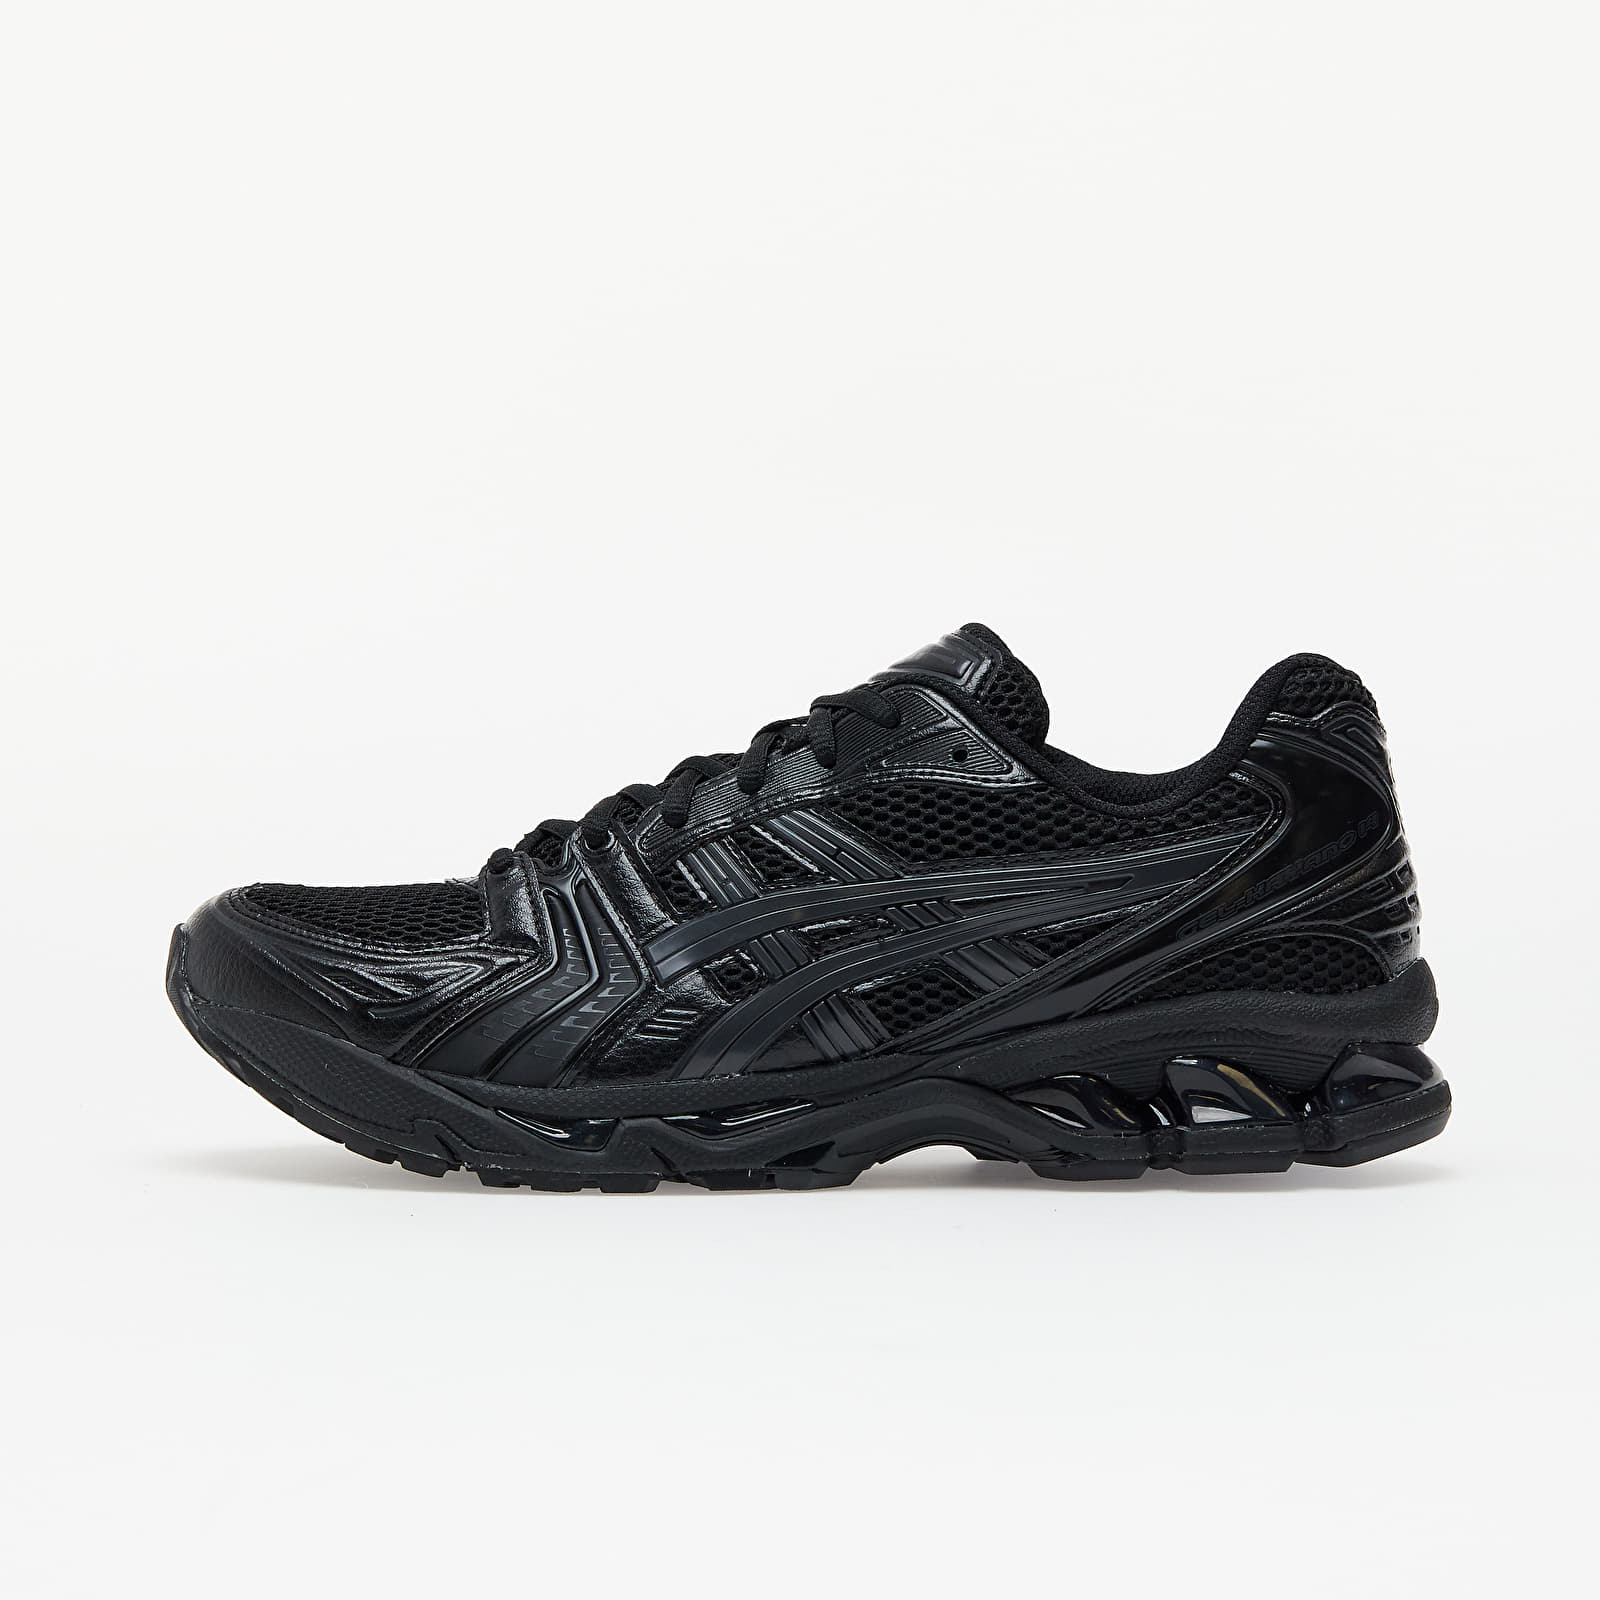 Asics Gel-Kayano 14 Black/ Graphite Grey 1201A019-001